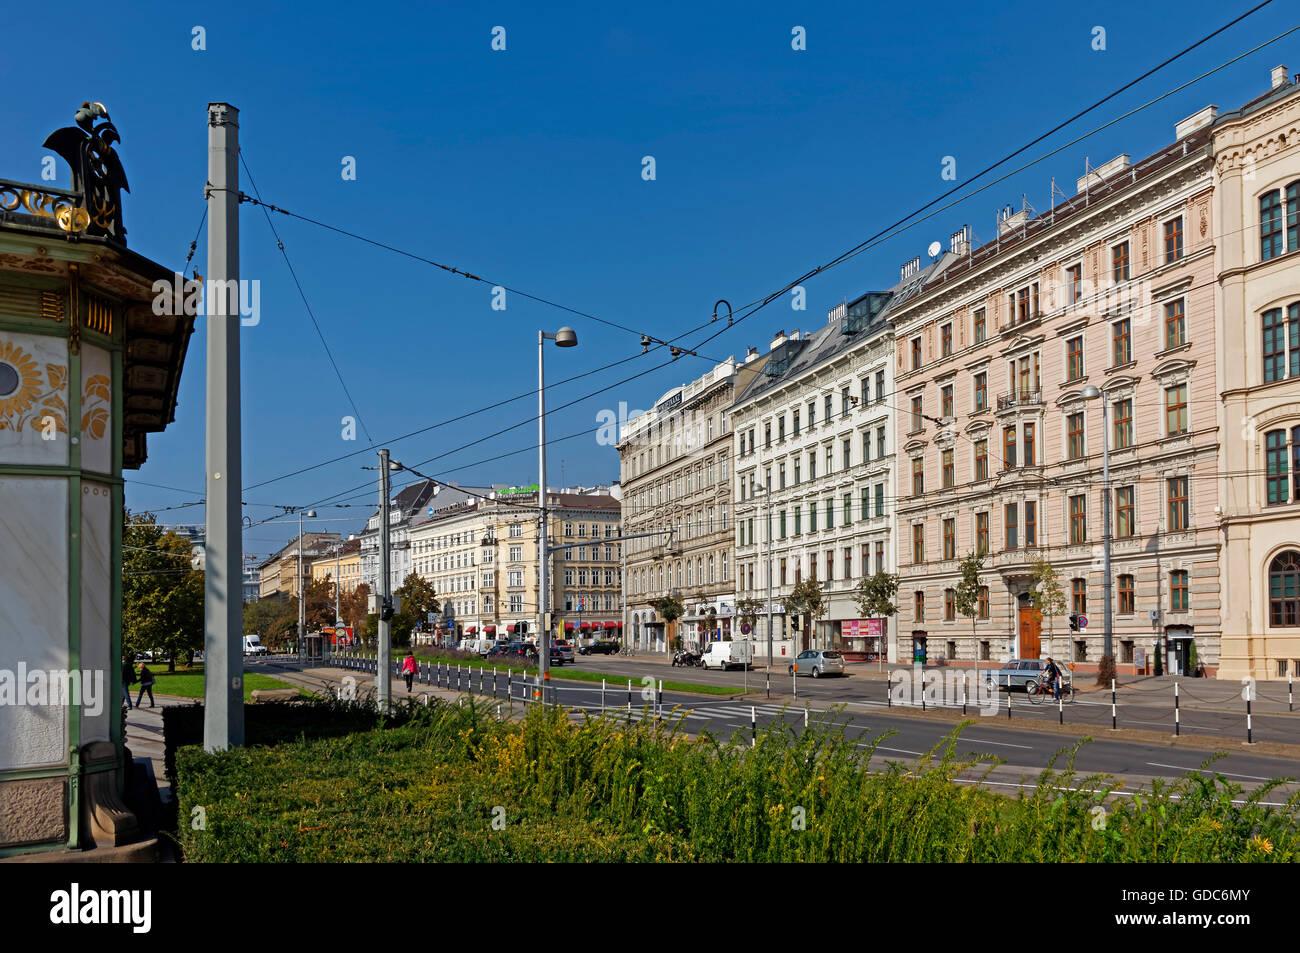 houses,Otto Wagner's pavilion,subway station,Karlsplatz, - Stock Image